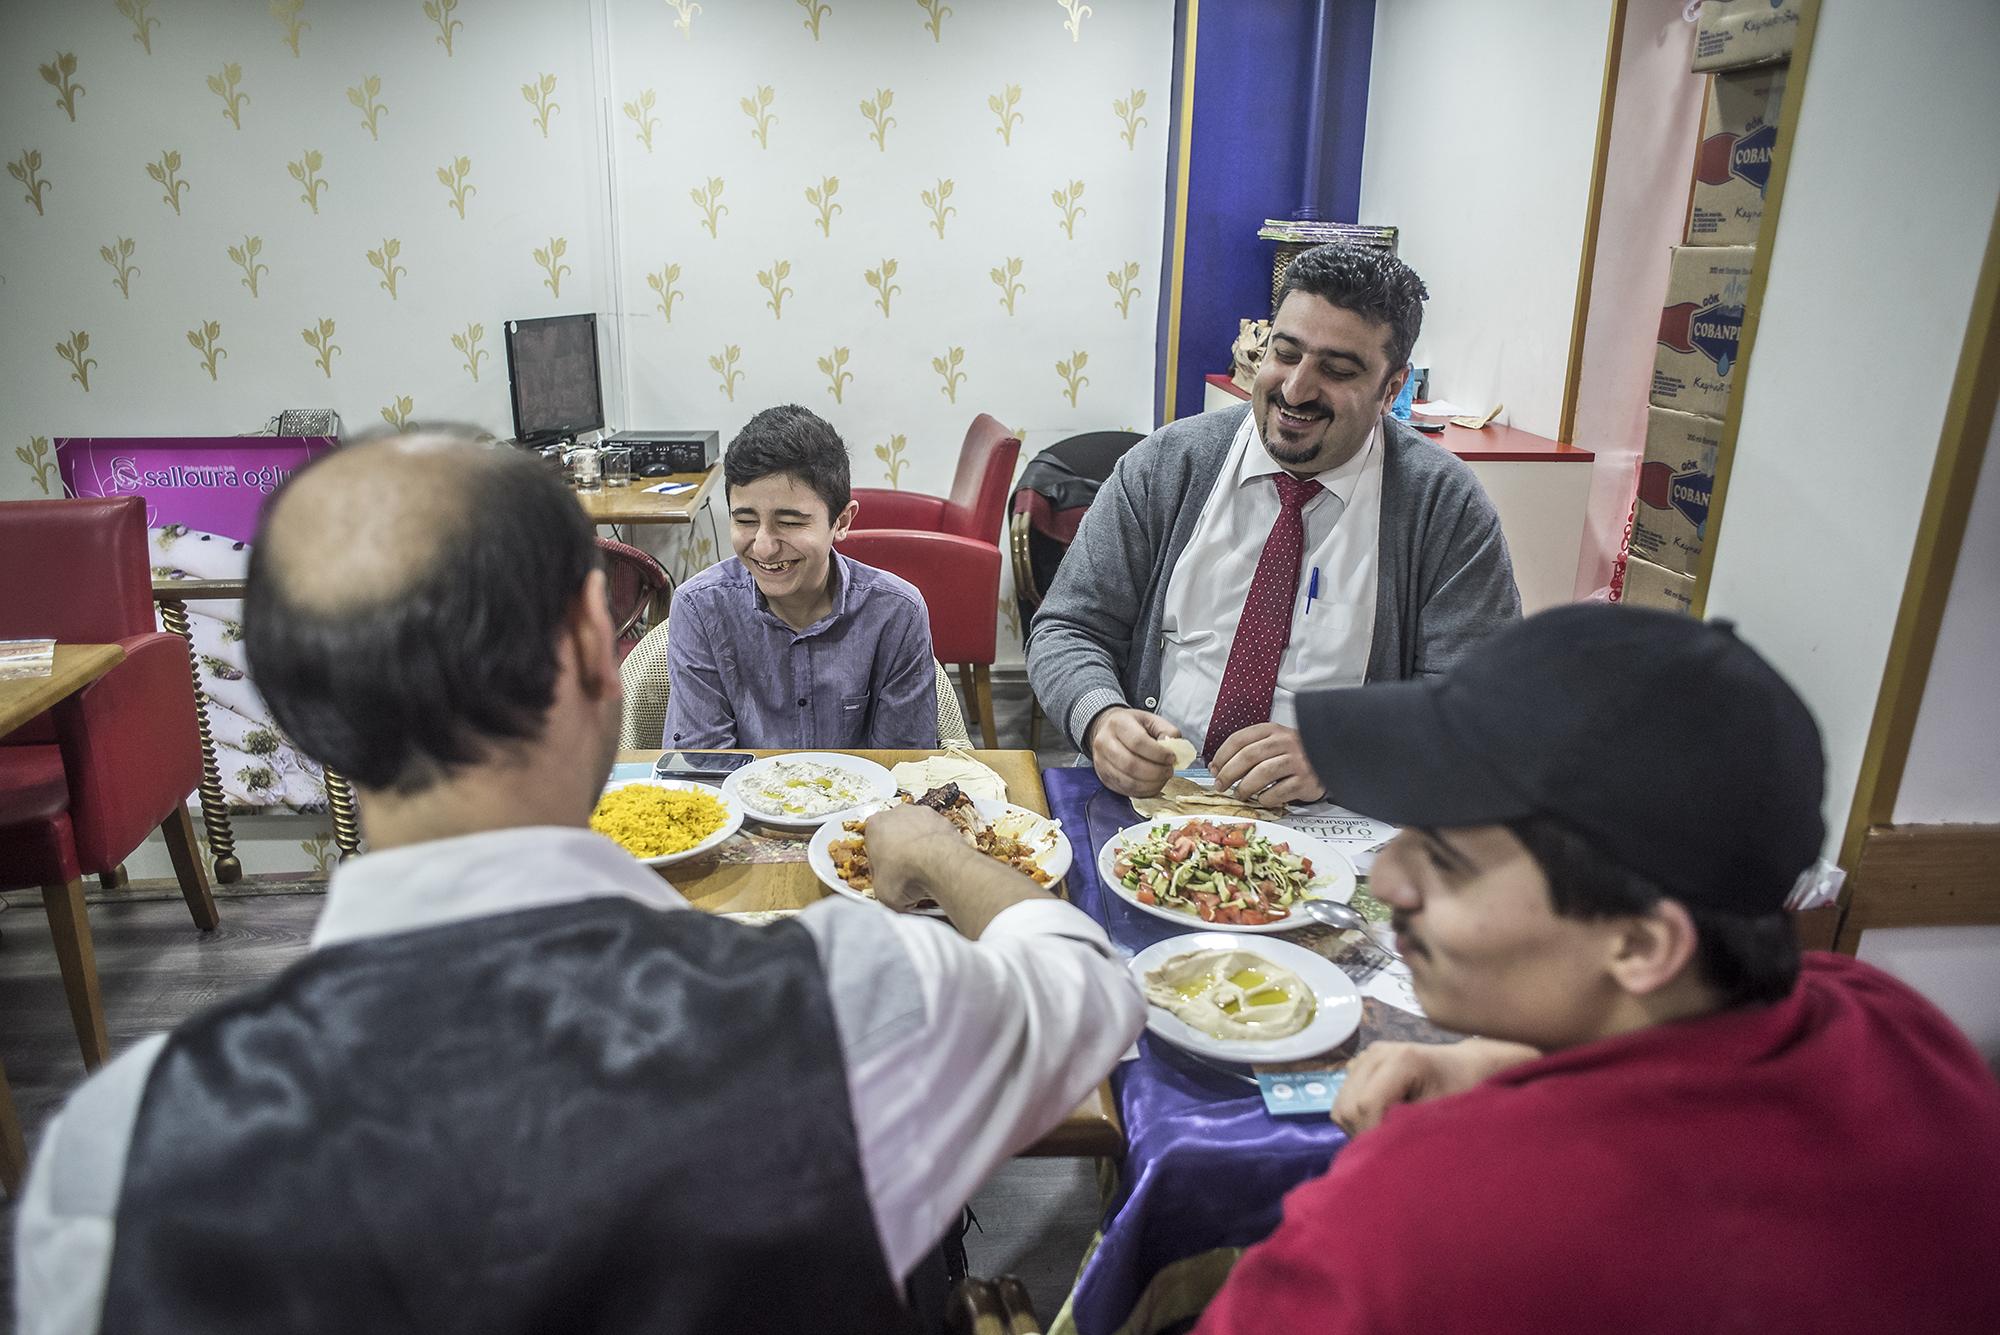 Salloura employees, including head waiter Abu Yazan (top right) sit down for a meal. (Photo by Joris van Gennip/GroundTruth)